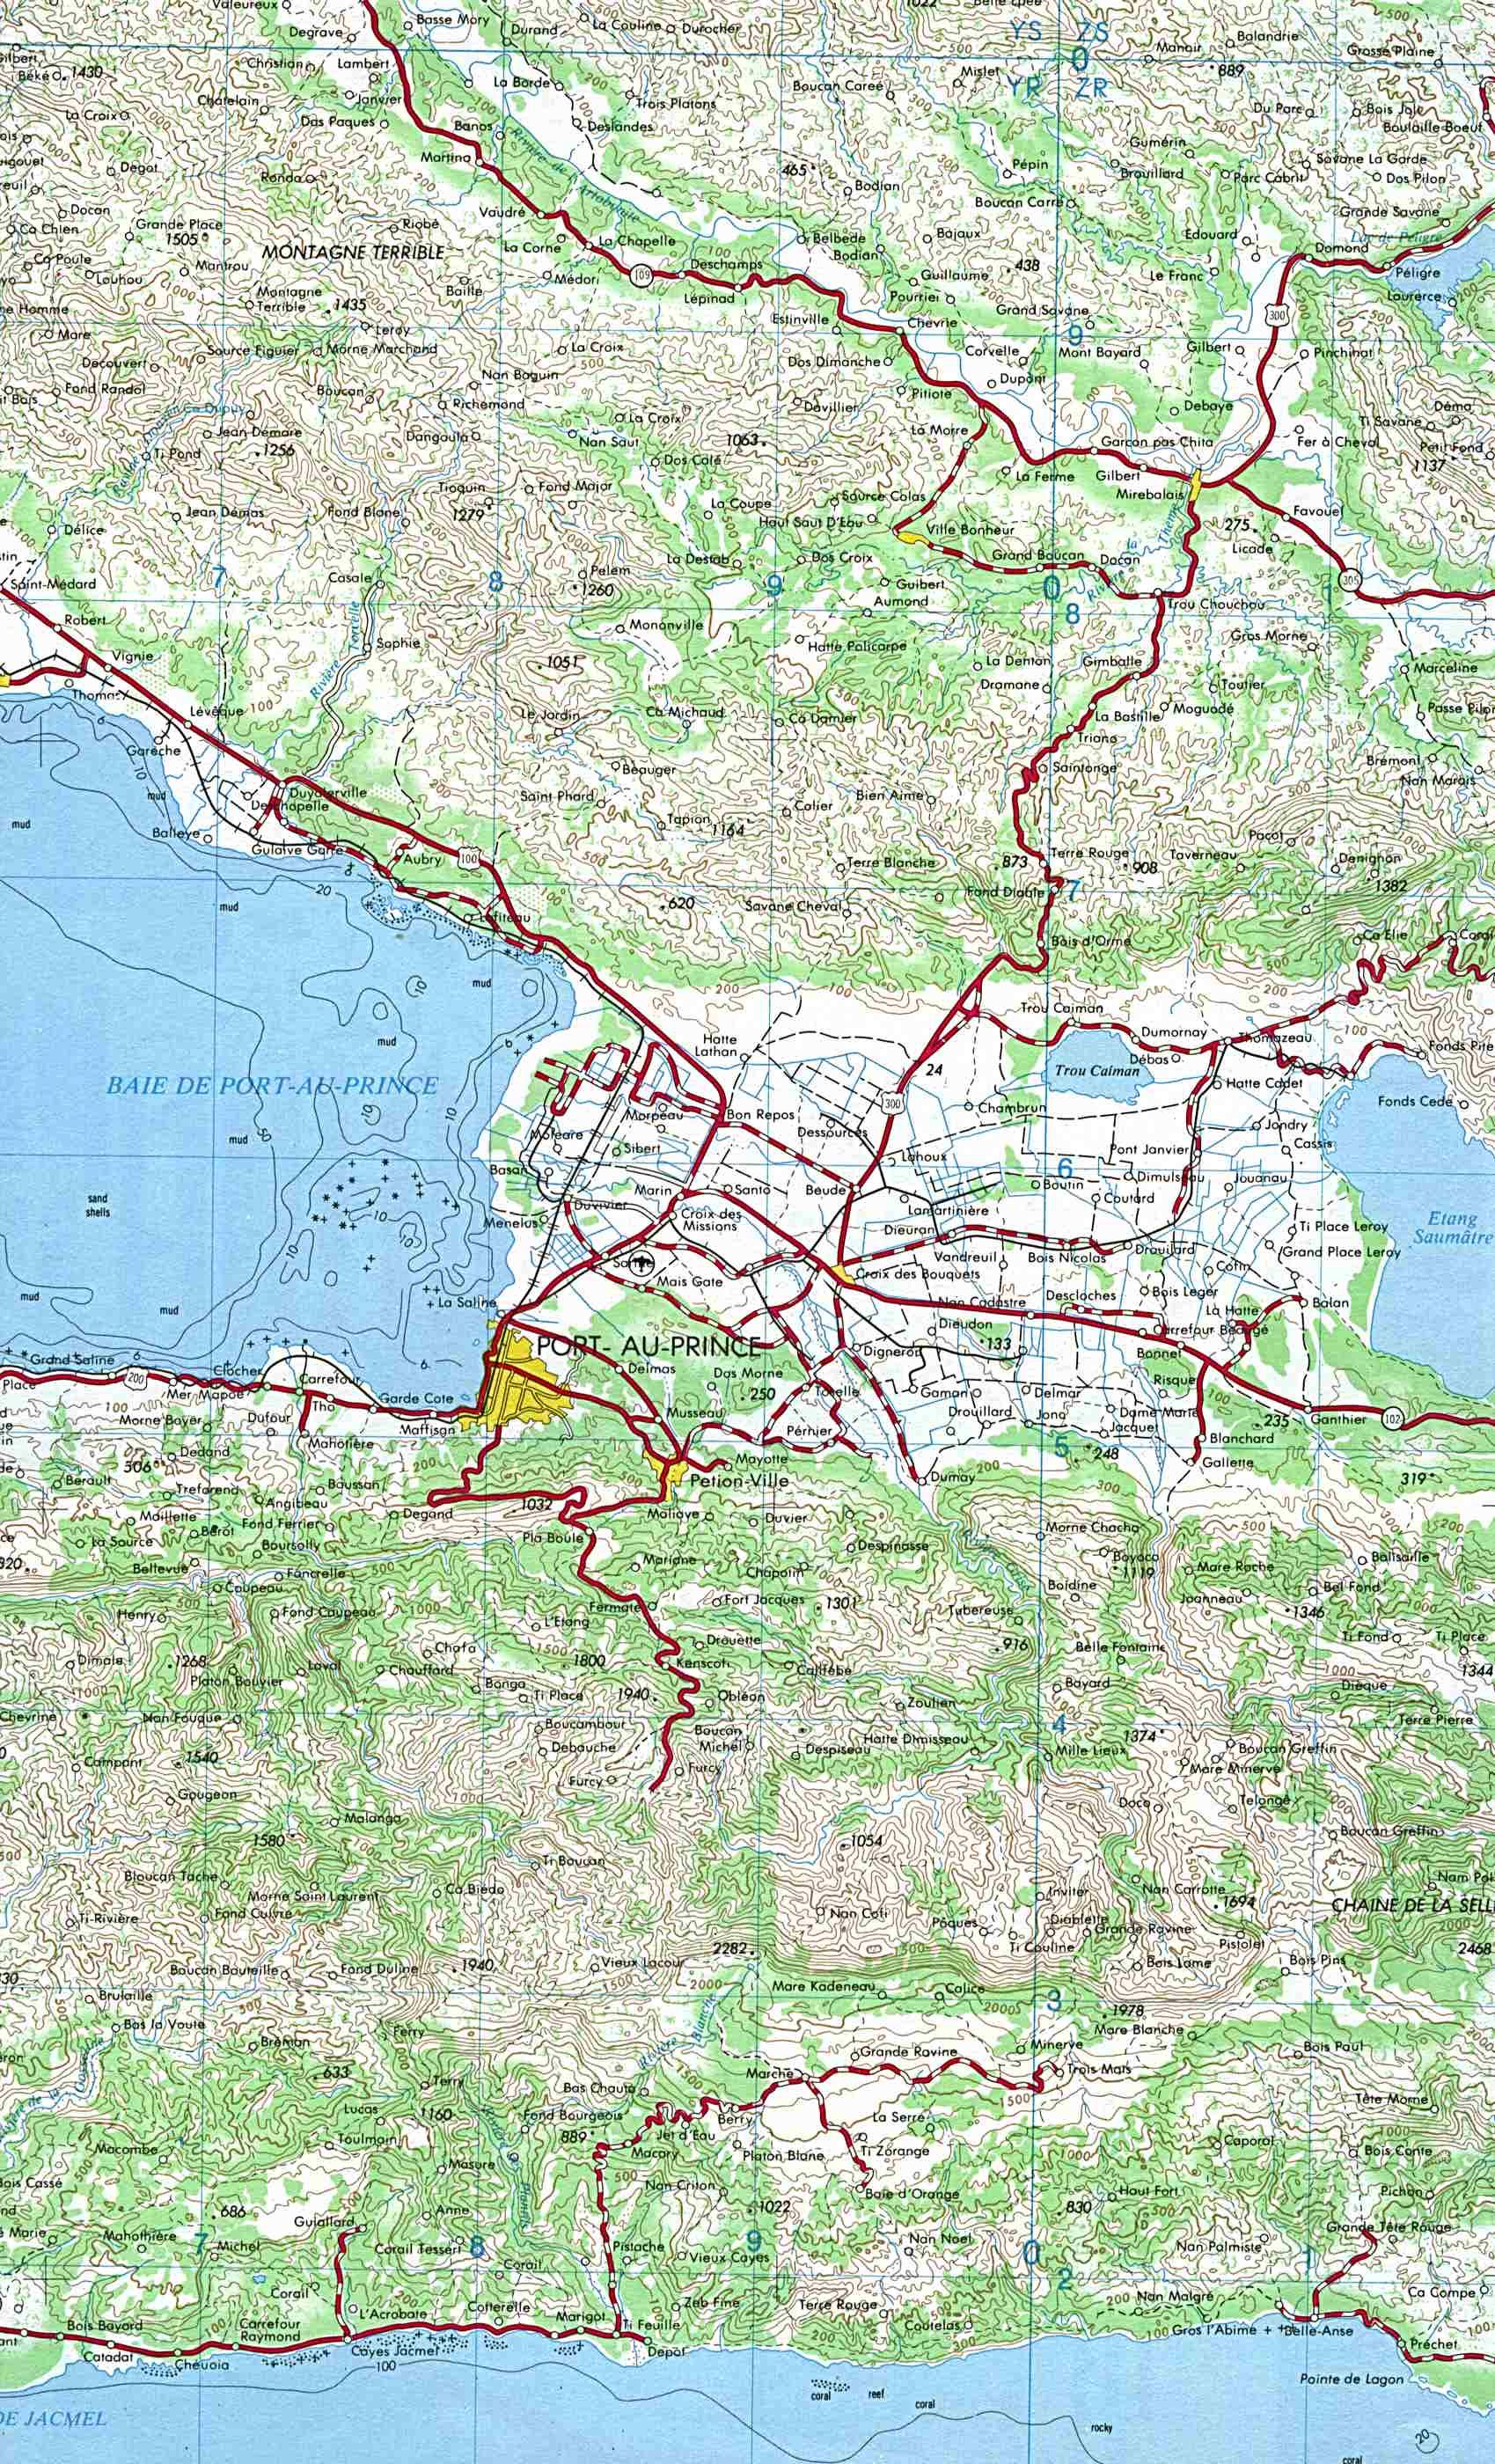 Haiti PortauPrince Topographic Map Haiti ReliefWeb - Map haiti